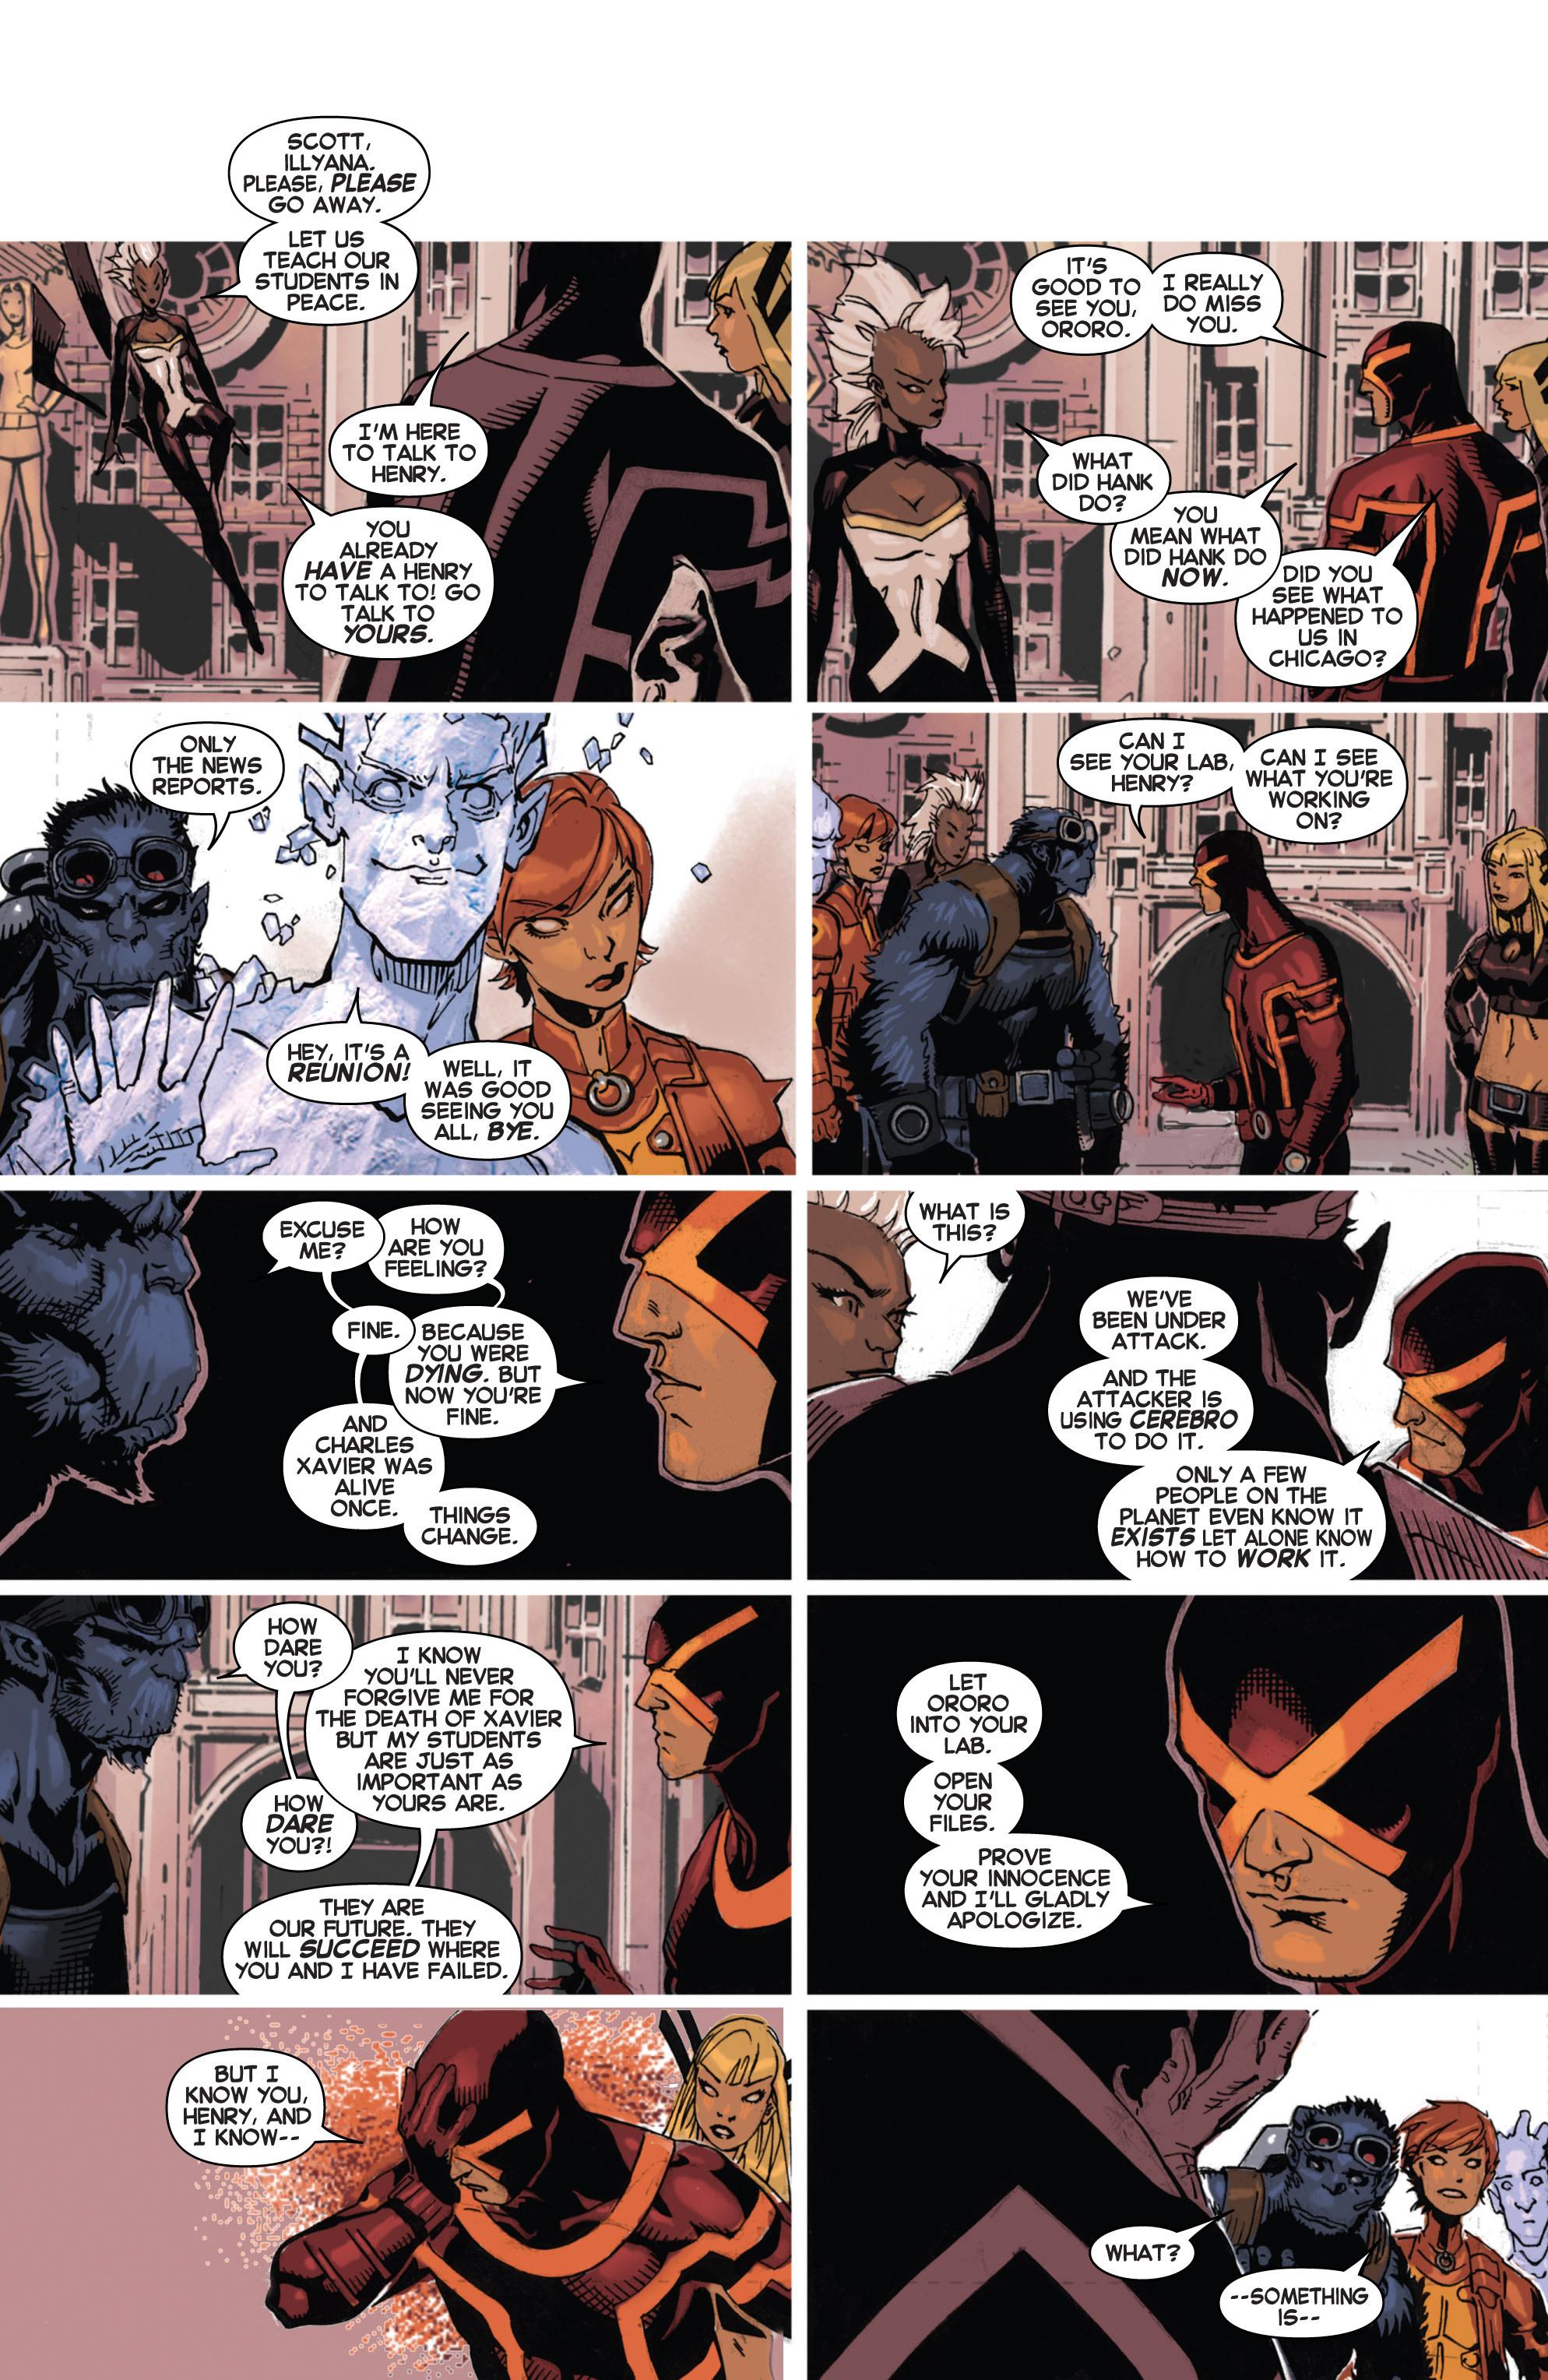 Read online Uncanny X-Men (2013) comic -  Issue # _TPB 4 - vs. S.H.I.E.L.D - 40